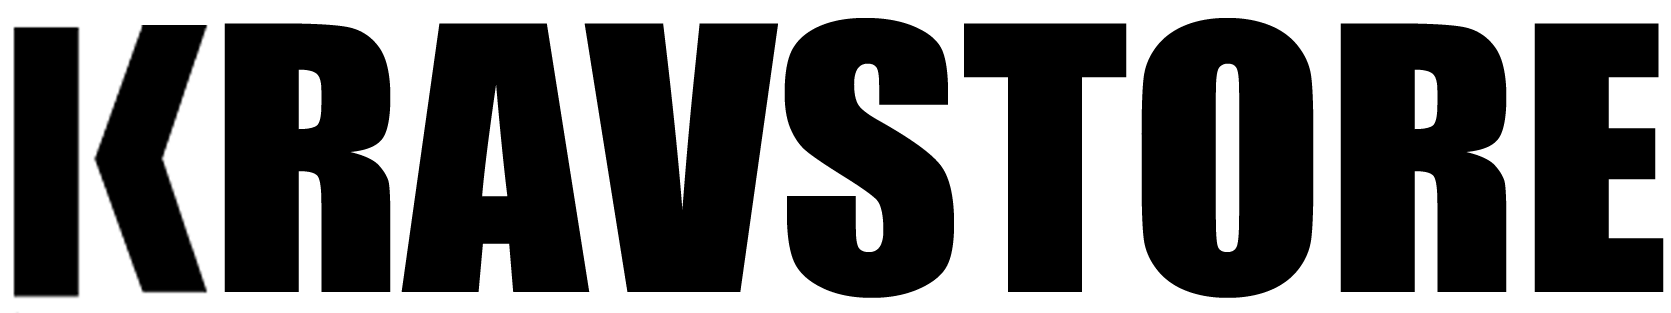 Kravstore